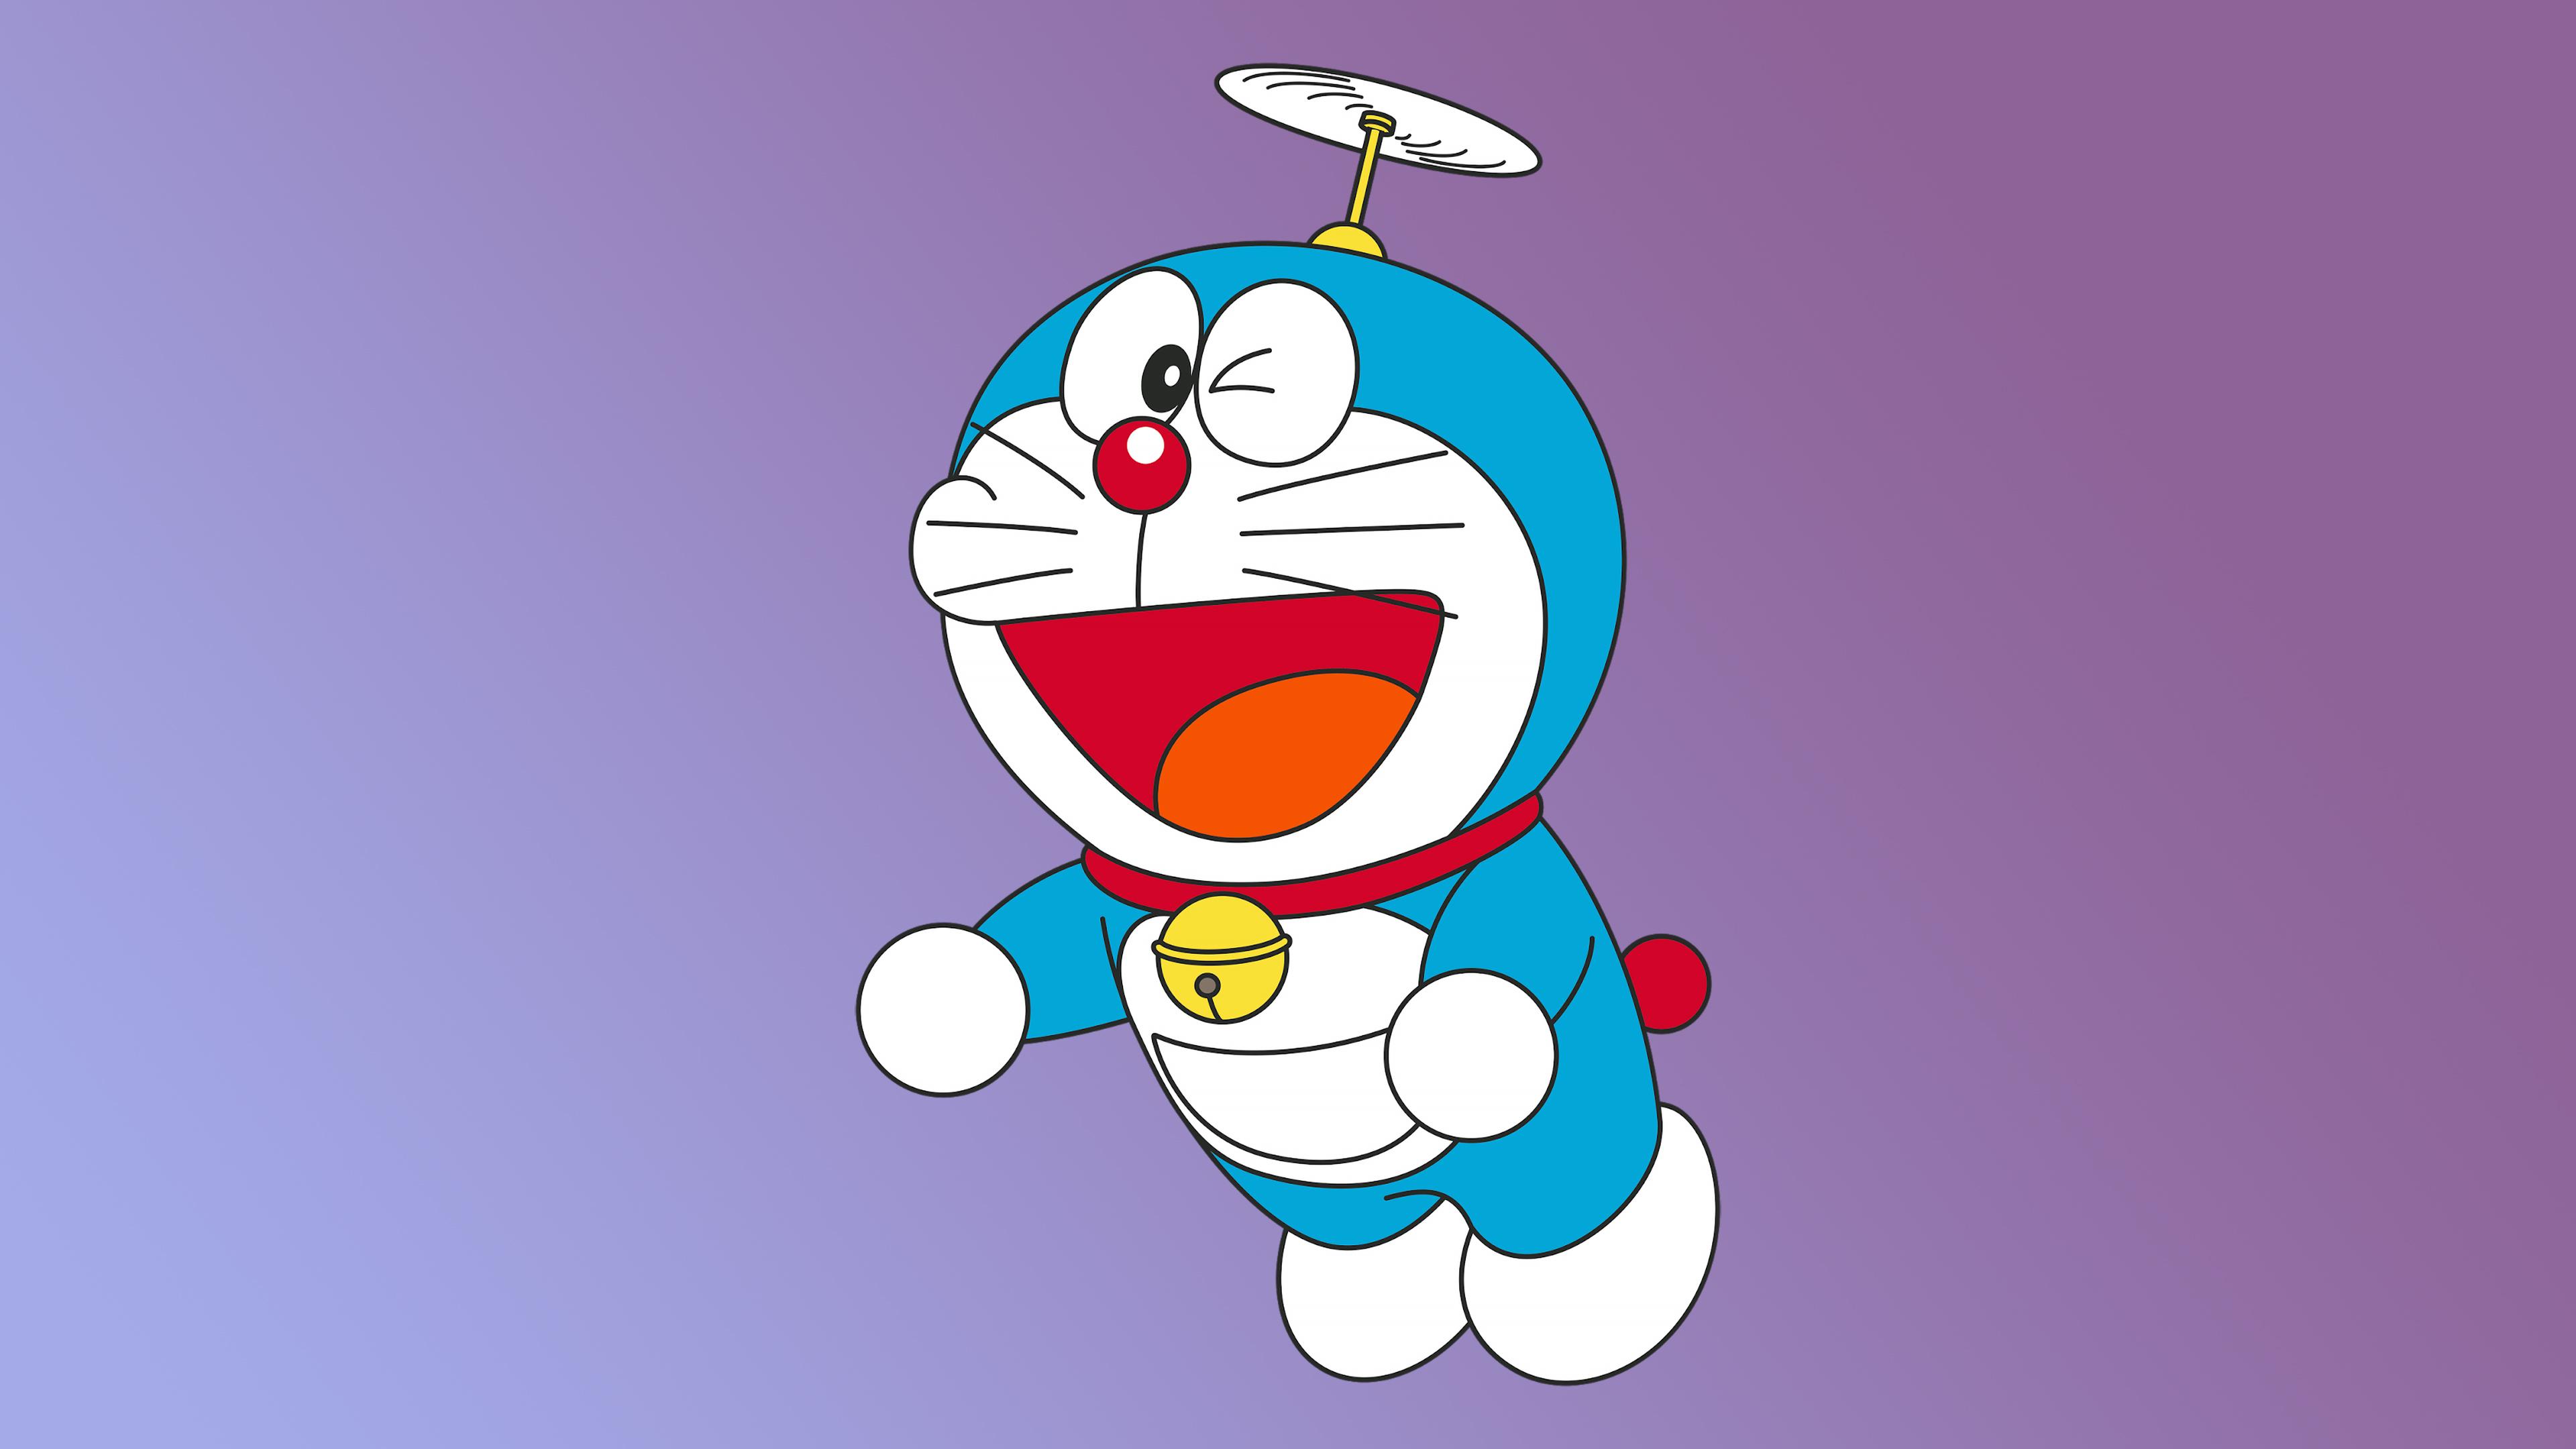 Doraemon Minimal 4k Wallpaper Hd Cartoon 4k Wallpapers Images